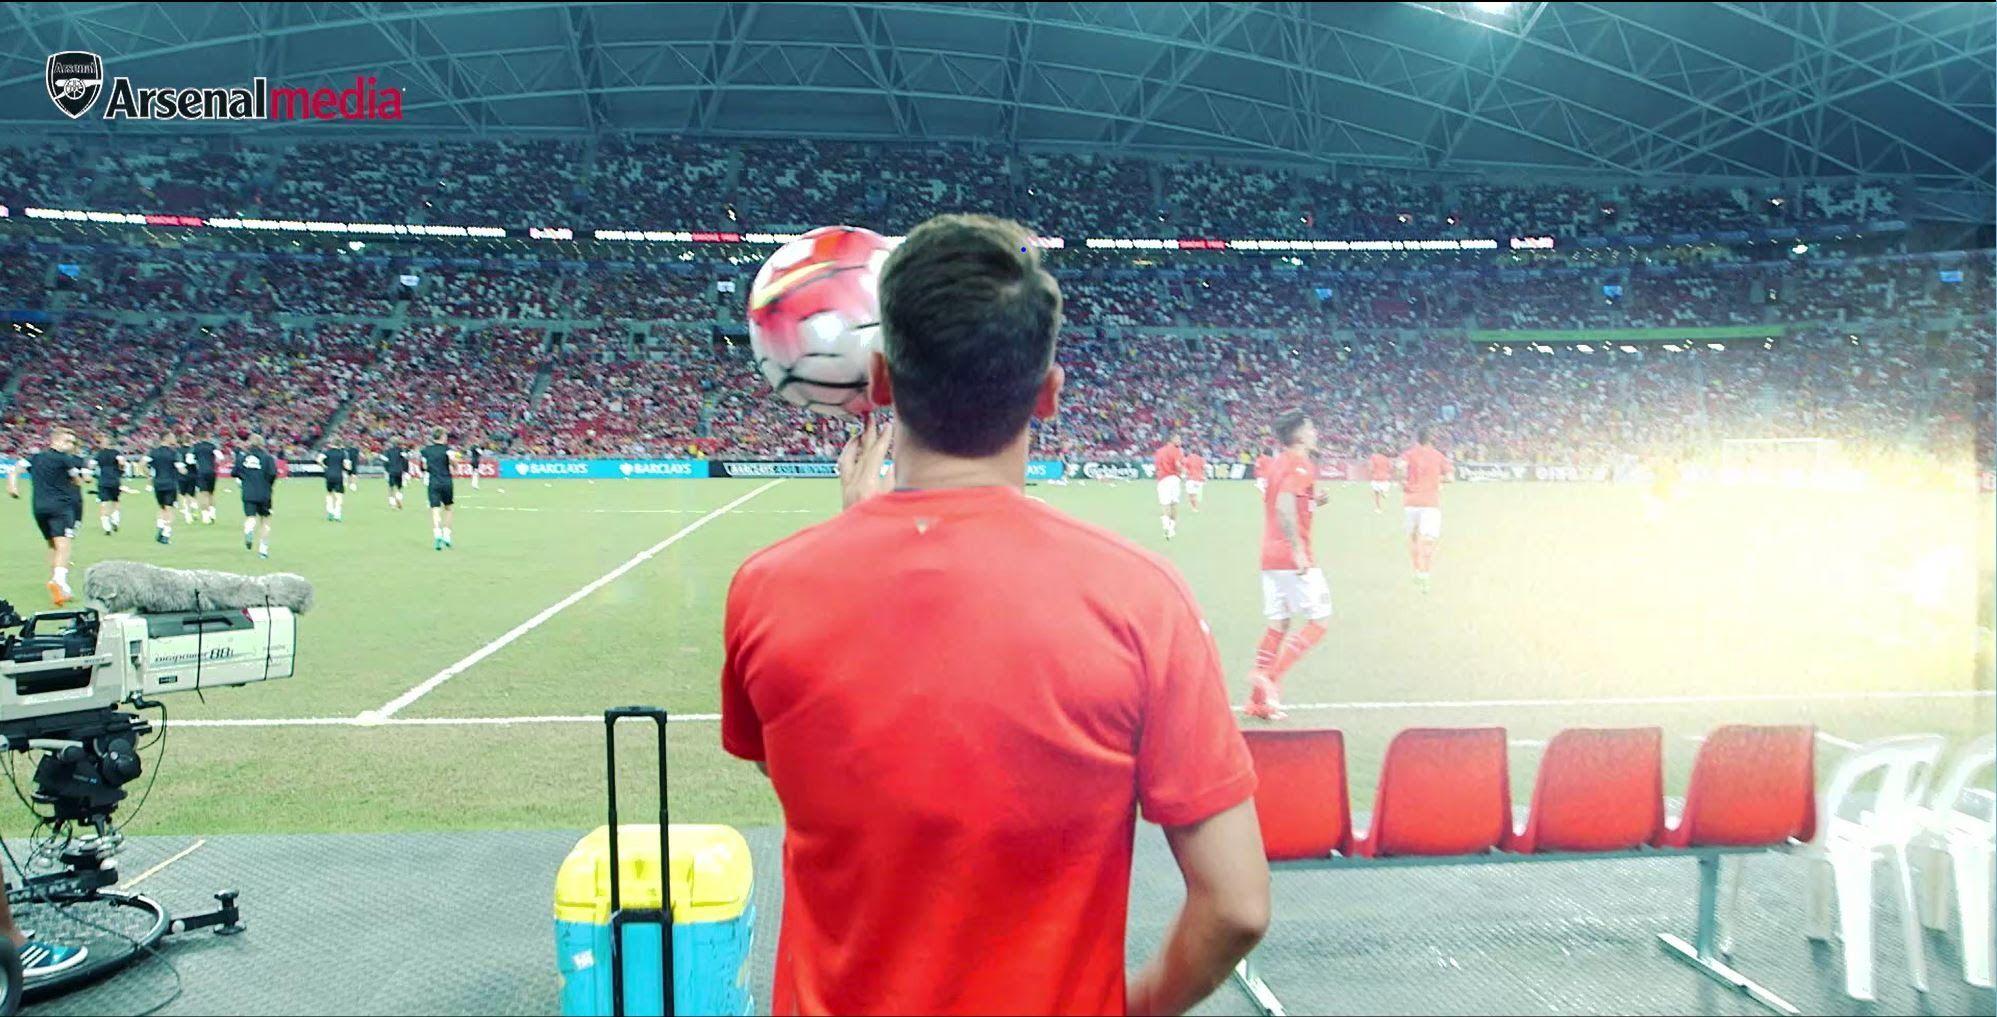 Showing some skills in Arsenal training | Mesut Özil - YouTube